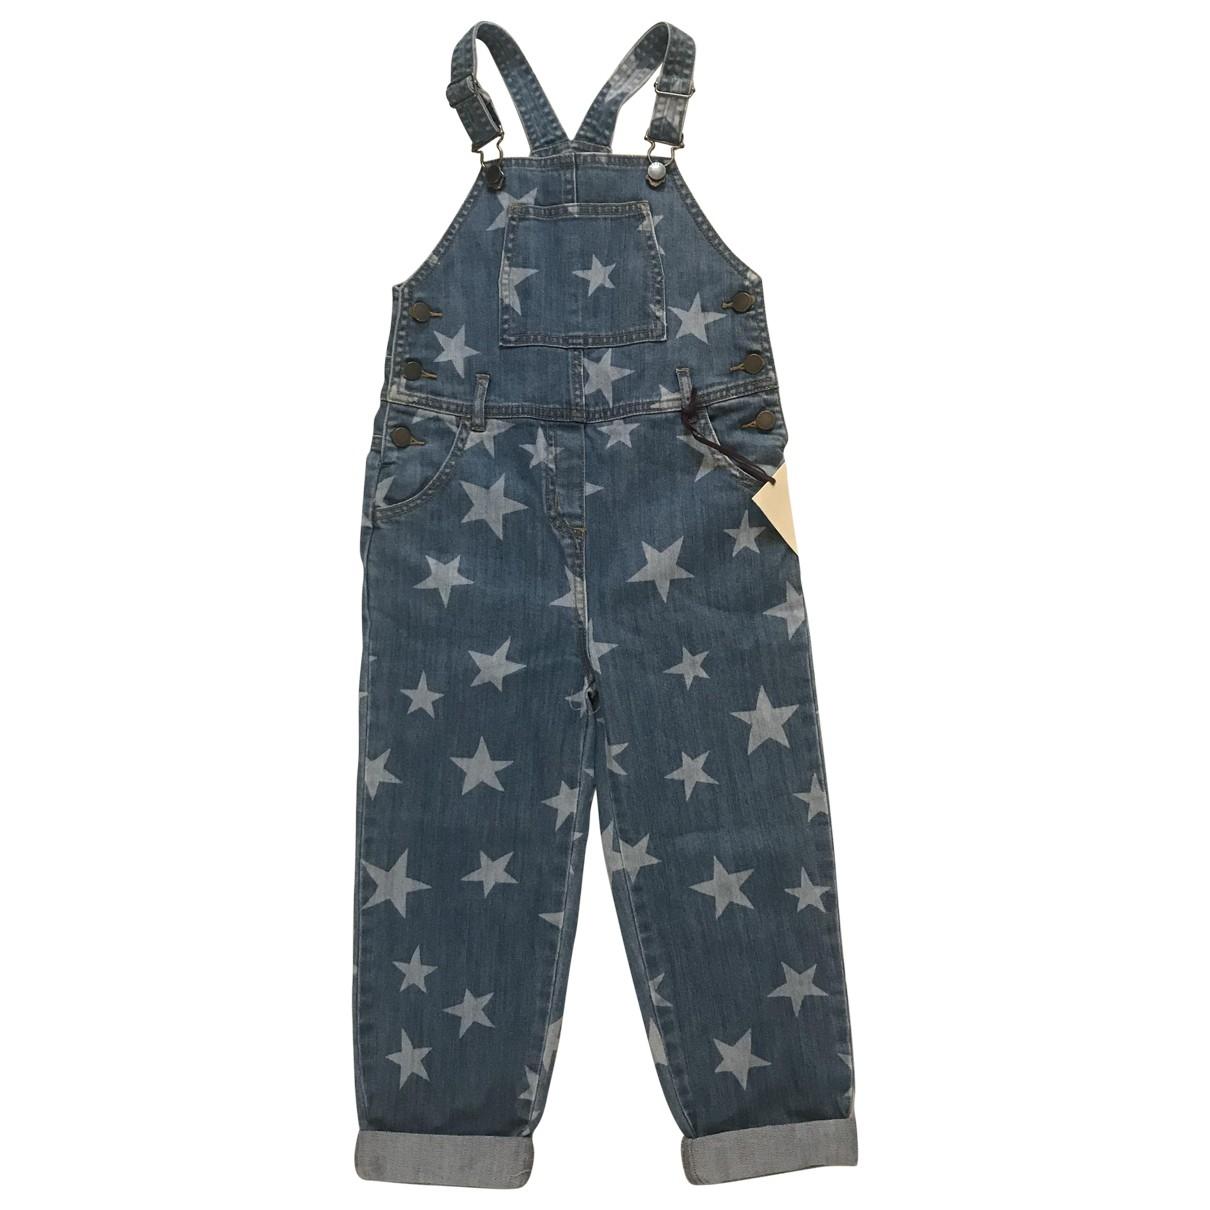 Stella Mccartney Kids \N Blue Denim - Jeans dress for Kids 6 years - until 45 inches UK